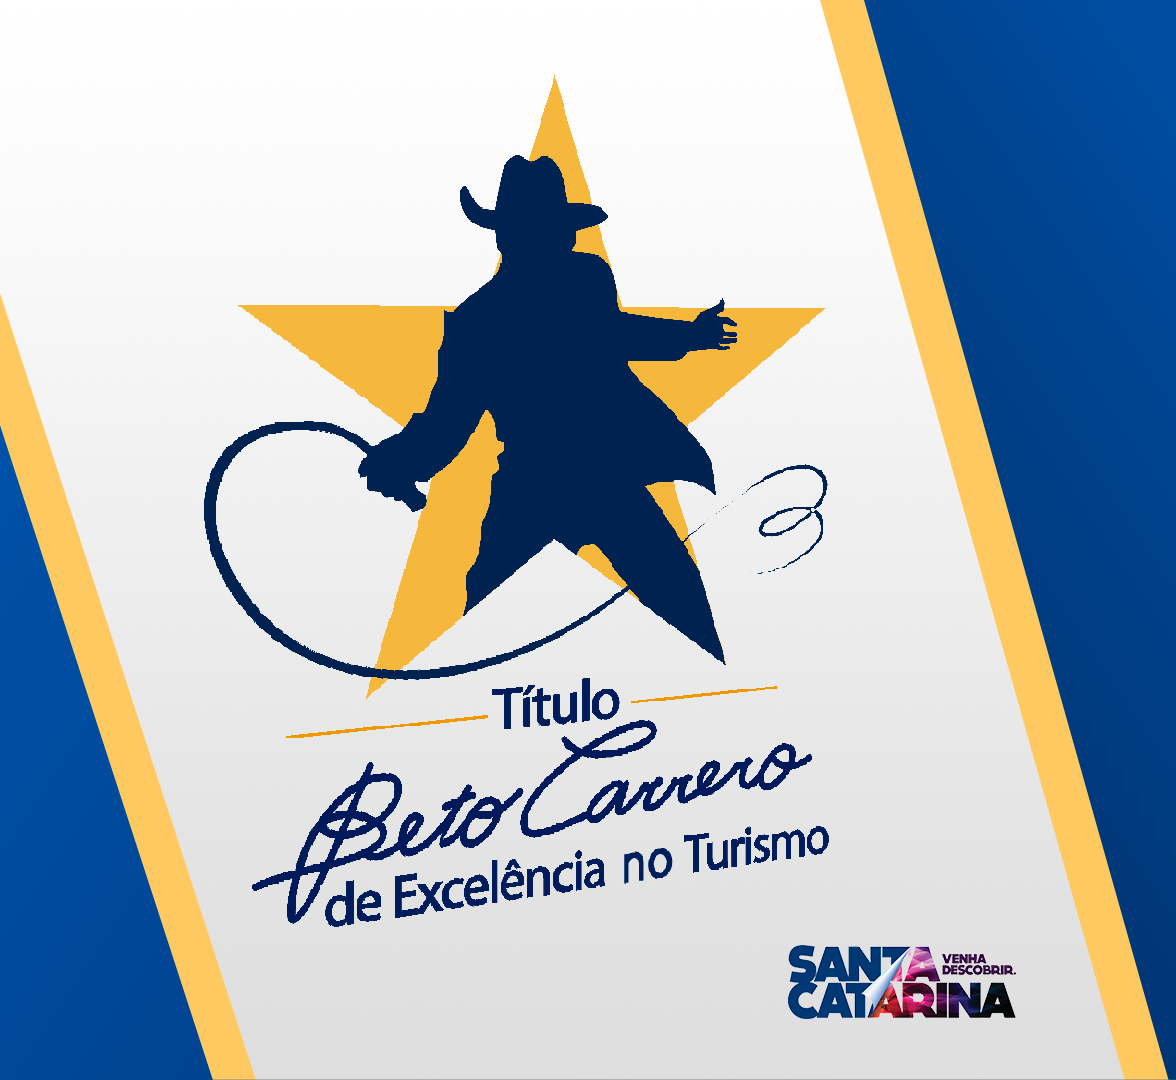 Prêmio Beto Carrero de Excelência - Turismo on line